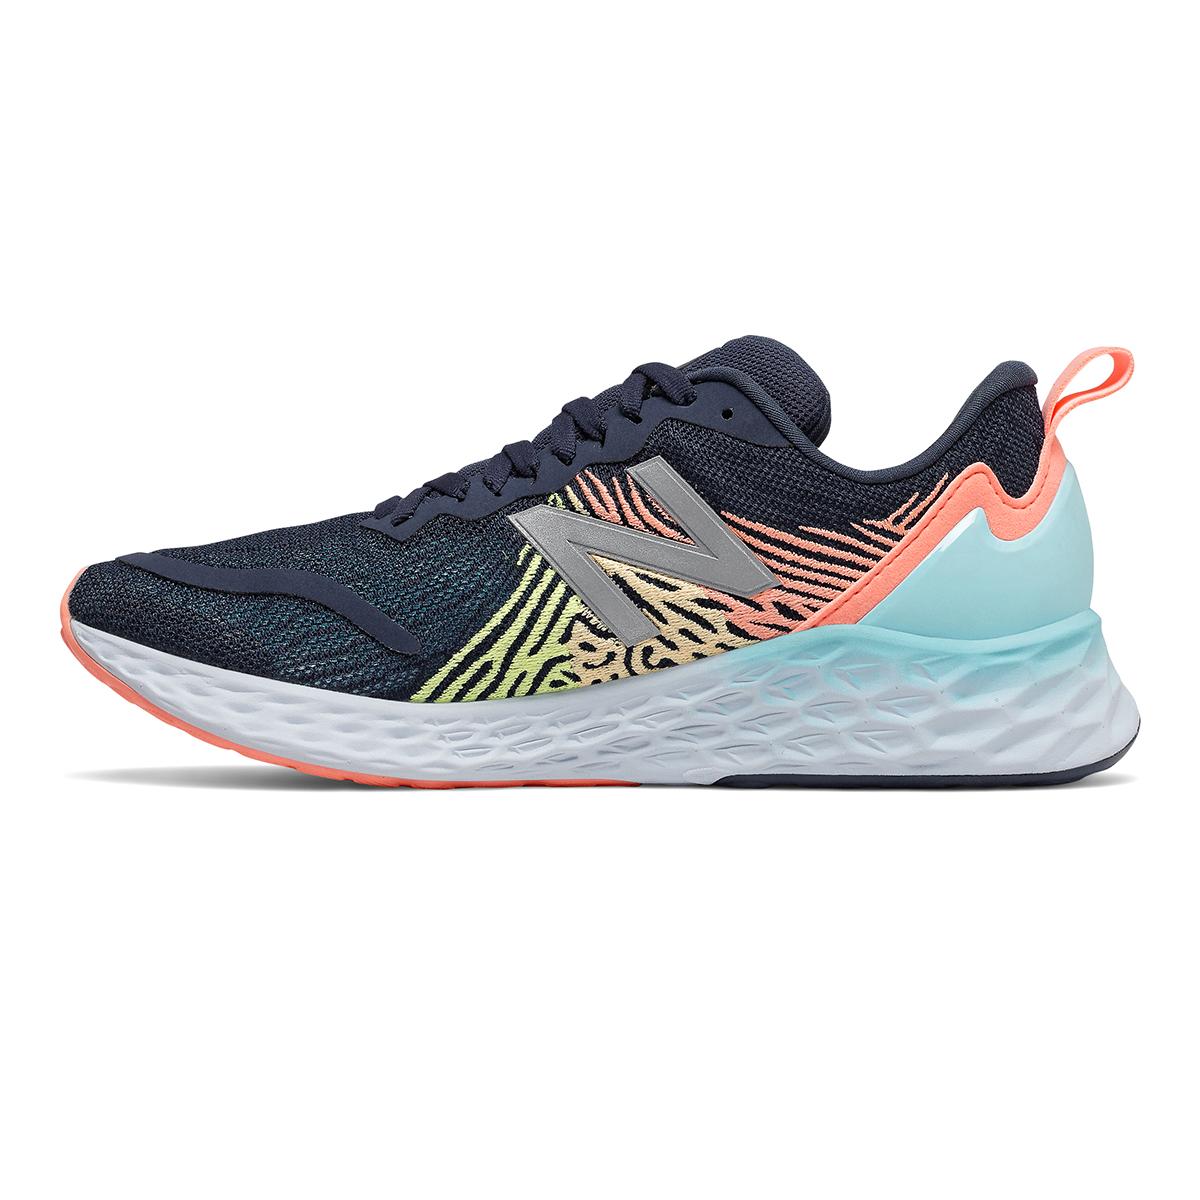 Women's New Balance Tempo Running Shoe - Color: Natural Indigo - Size: 5 - Width: Regular, Natural Indigo, large, image 2